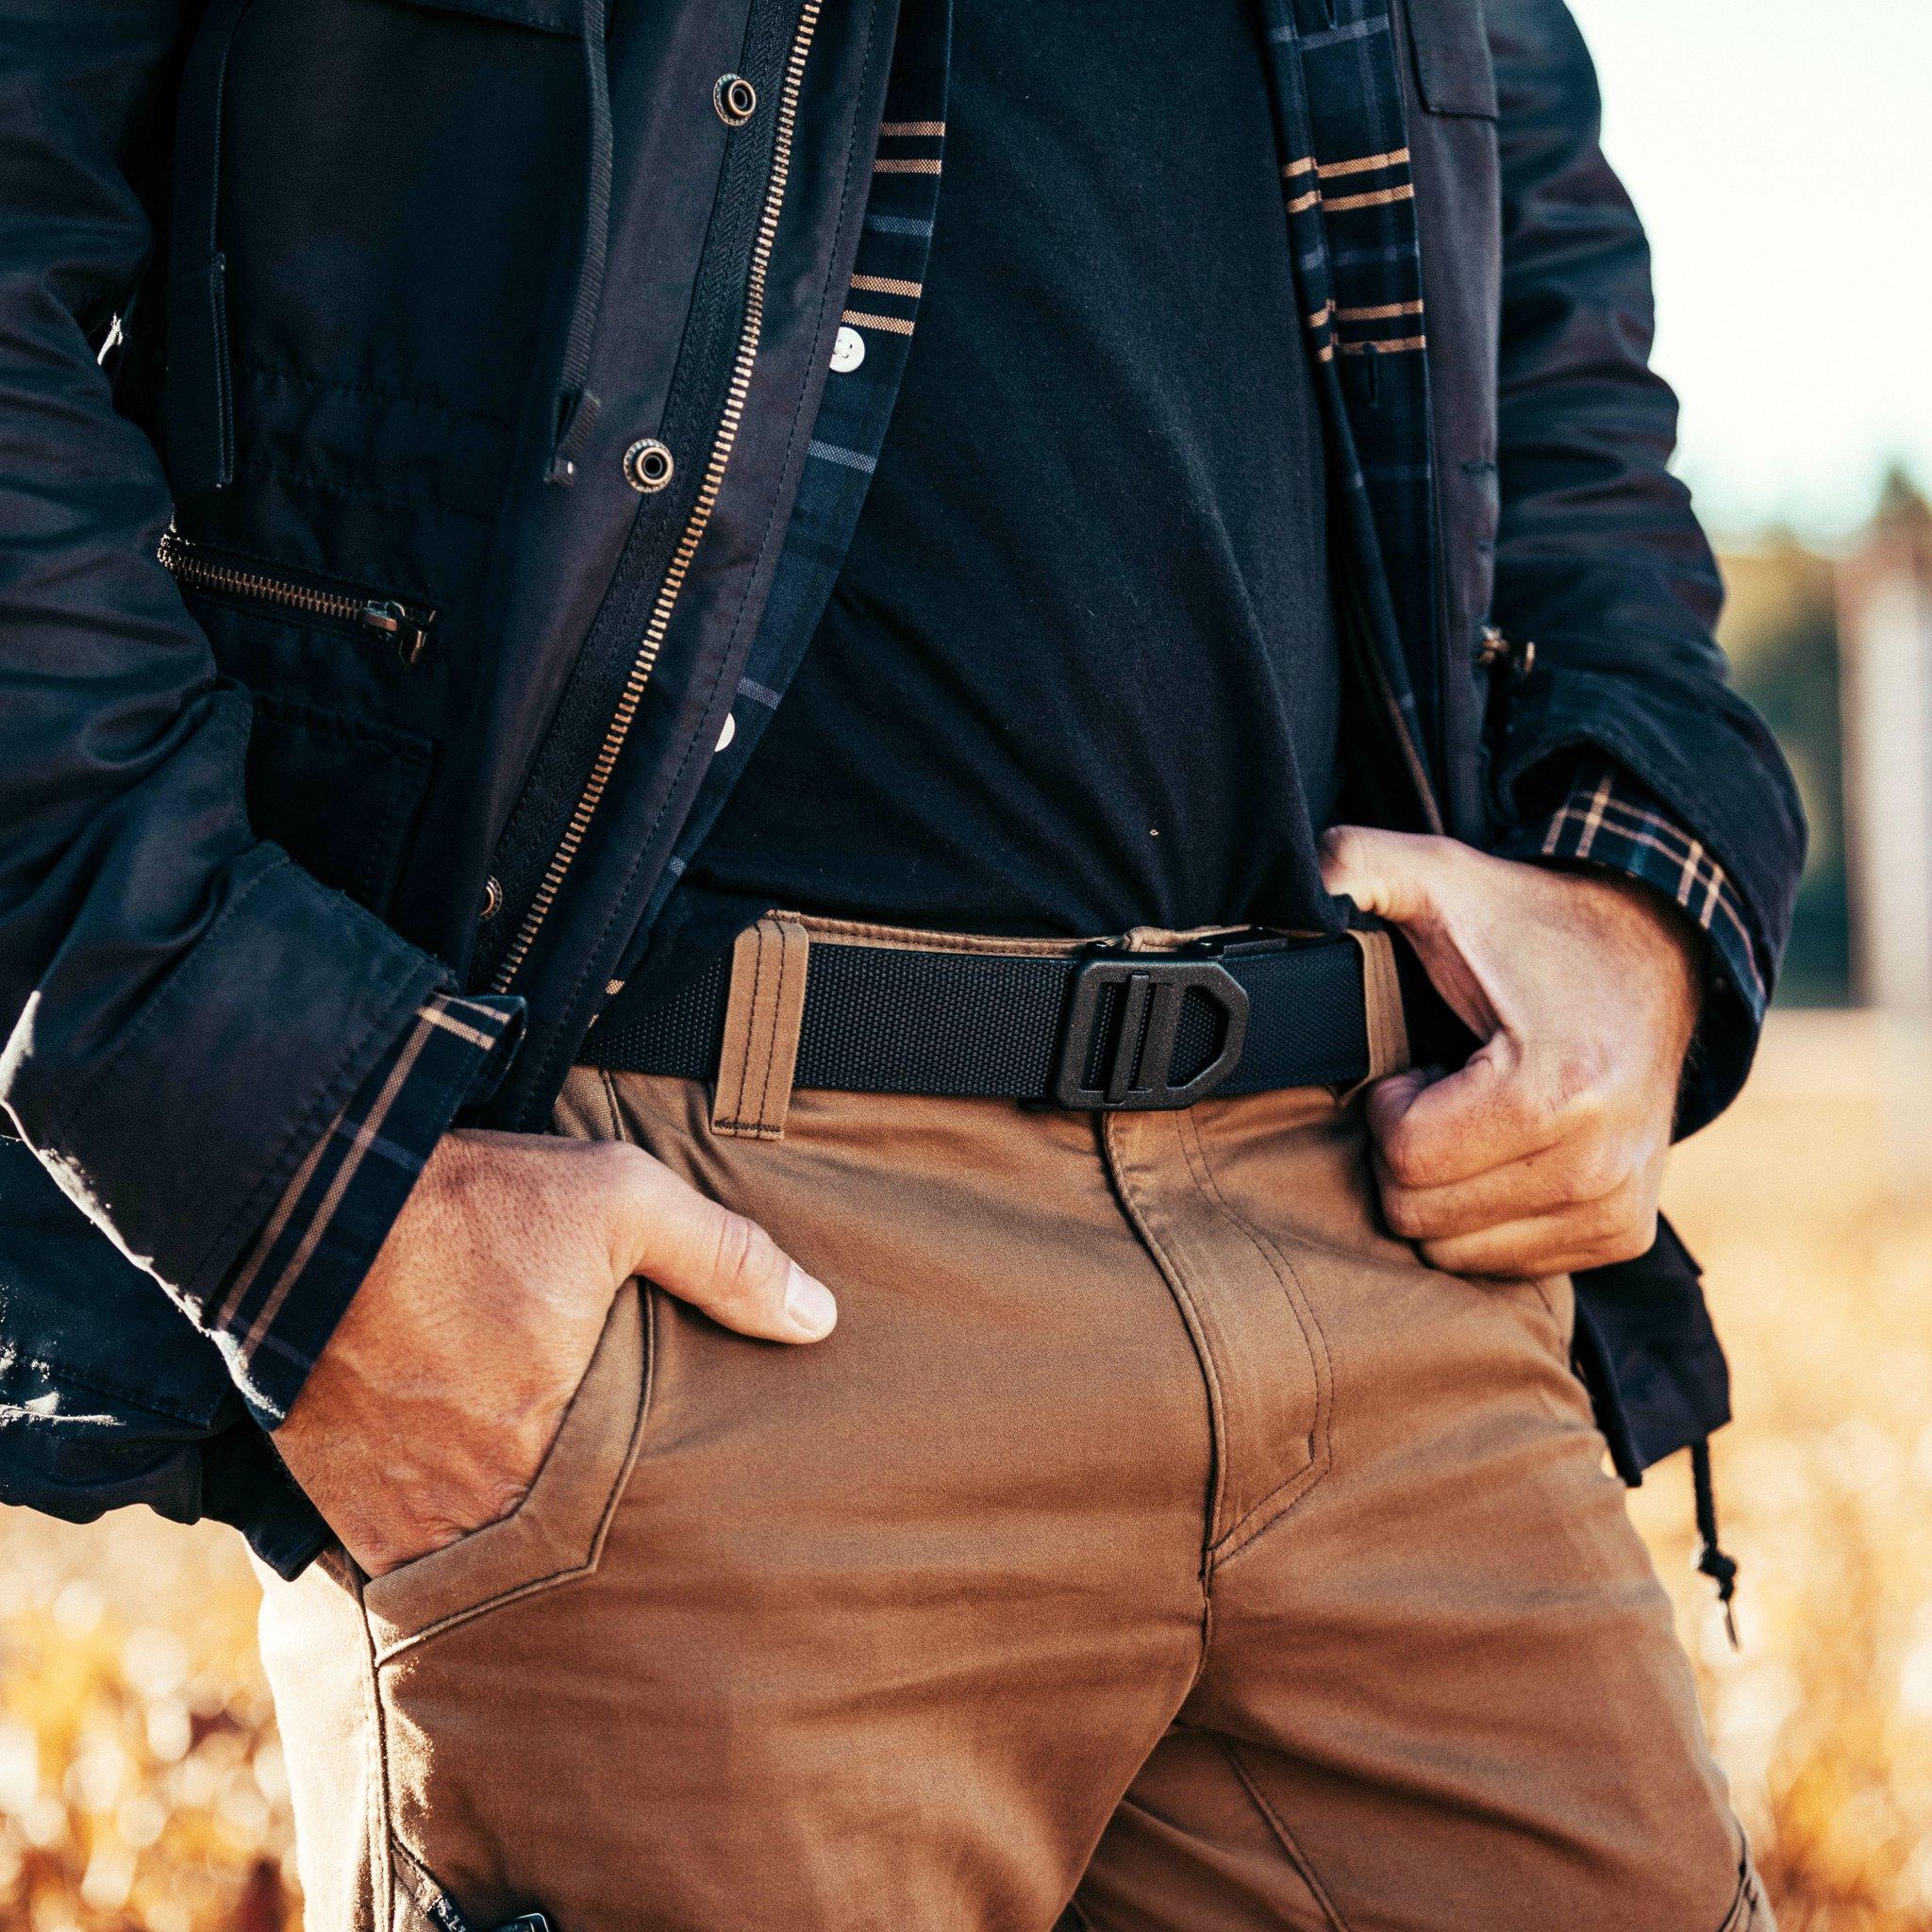 Kore Essentials On Twitter X5 Buckle Black Tactical Belt Shop Our Most Popular Reinforced Gun Belt Using Our Black Friday Weekend Code At Checkout Gear20 Https T Co Fkcvn3afwg Https T Co 8geii9v20a Kore essentials x5 black buckle black tactical gun belt. twitter